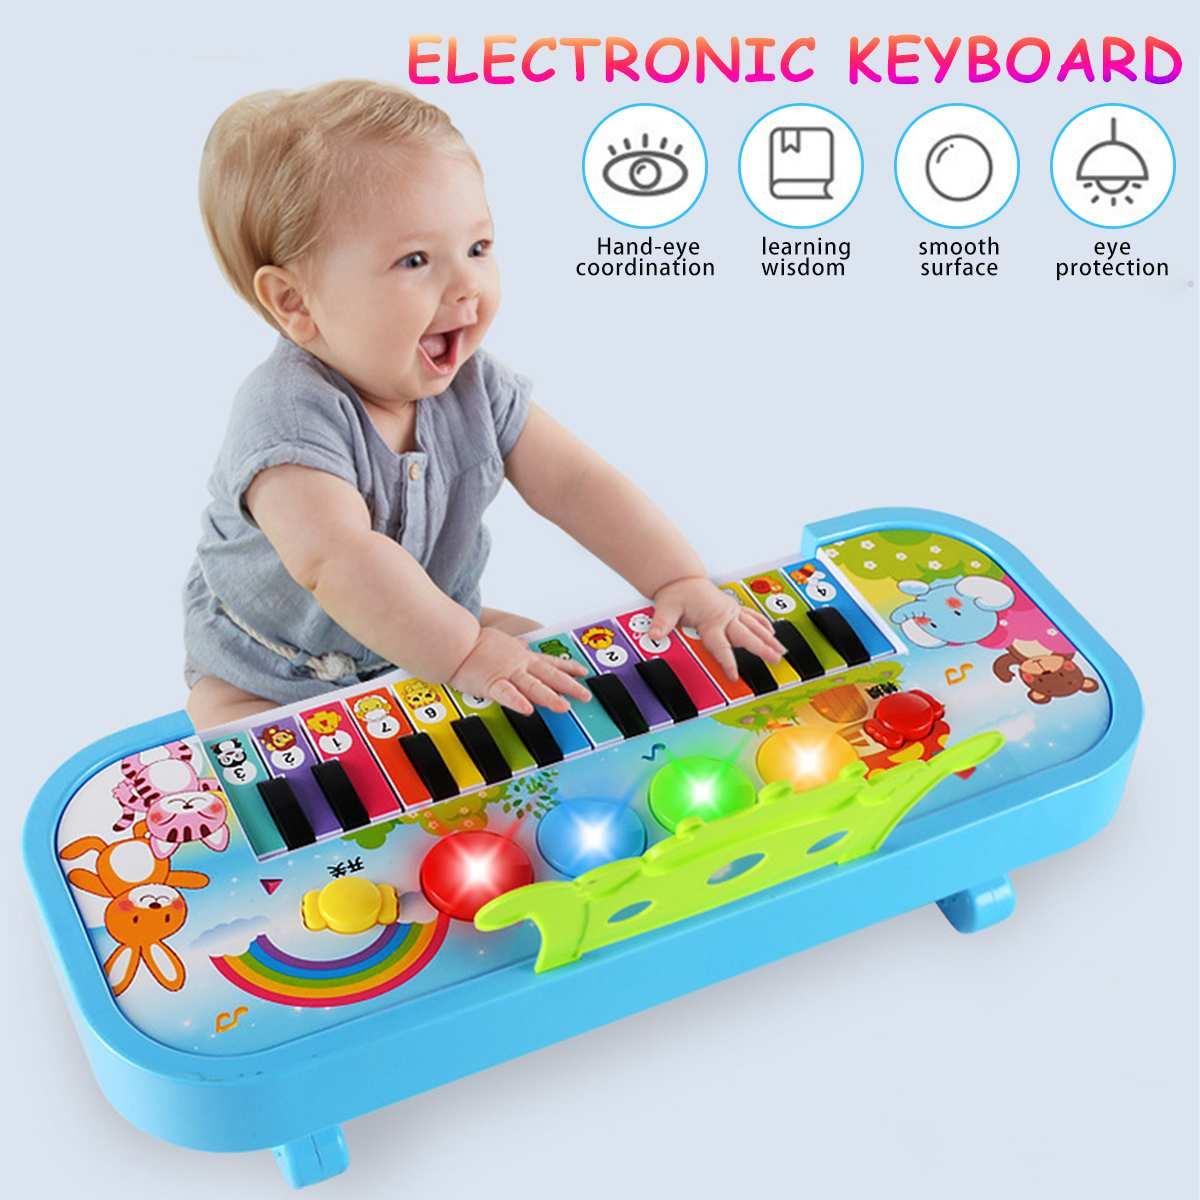 Infant Playing Educational Electronic Piano Baby Toys Children Keyboard Boys Girls Fingers Kids Music 24 Keys Gift Plastic